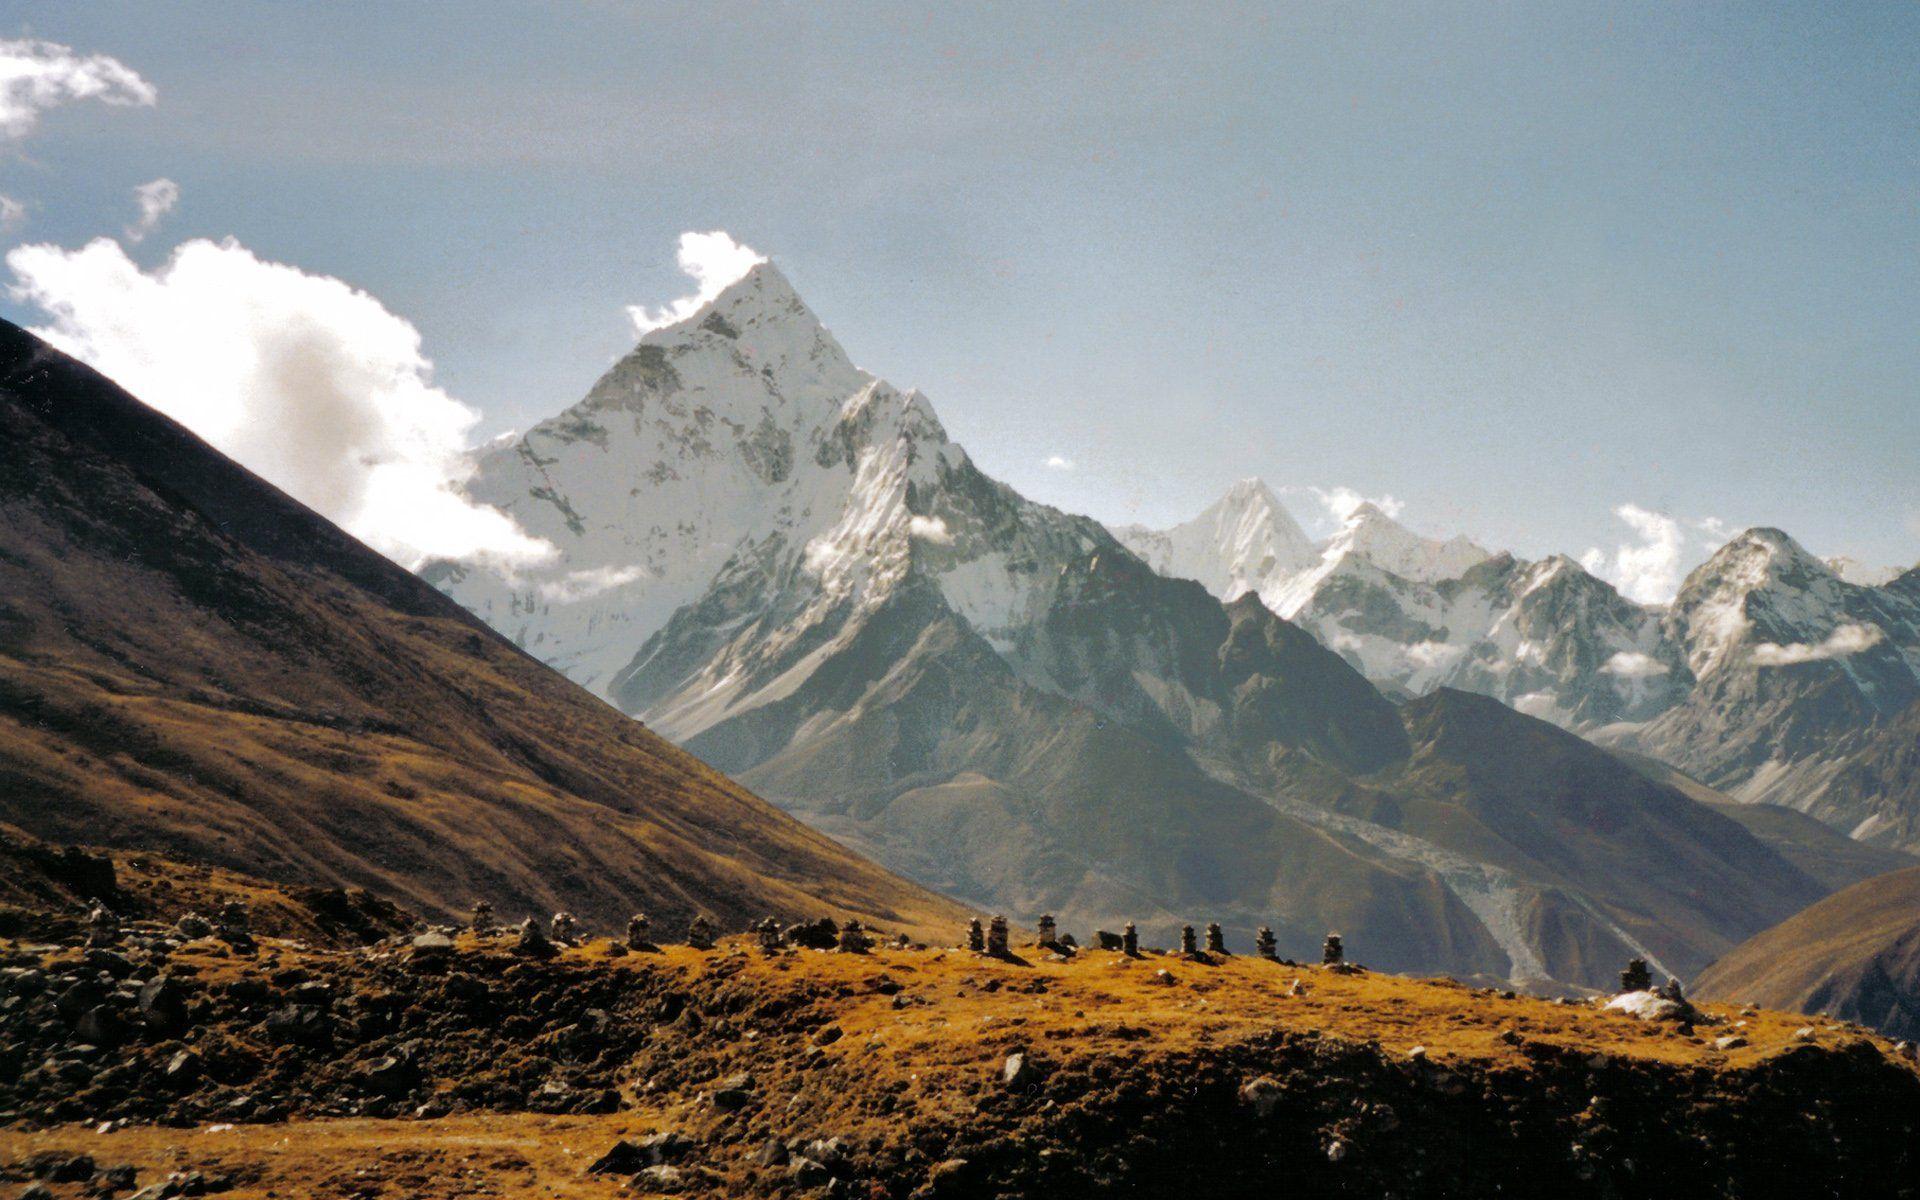 Nepal Wallpapers   Full HD wallpaper search 1920x1200